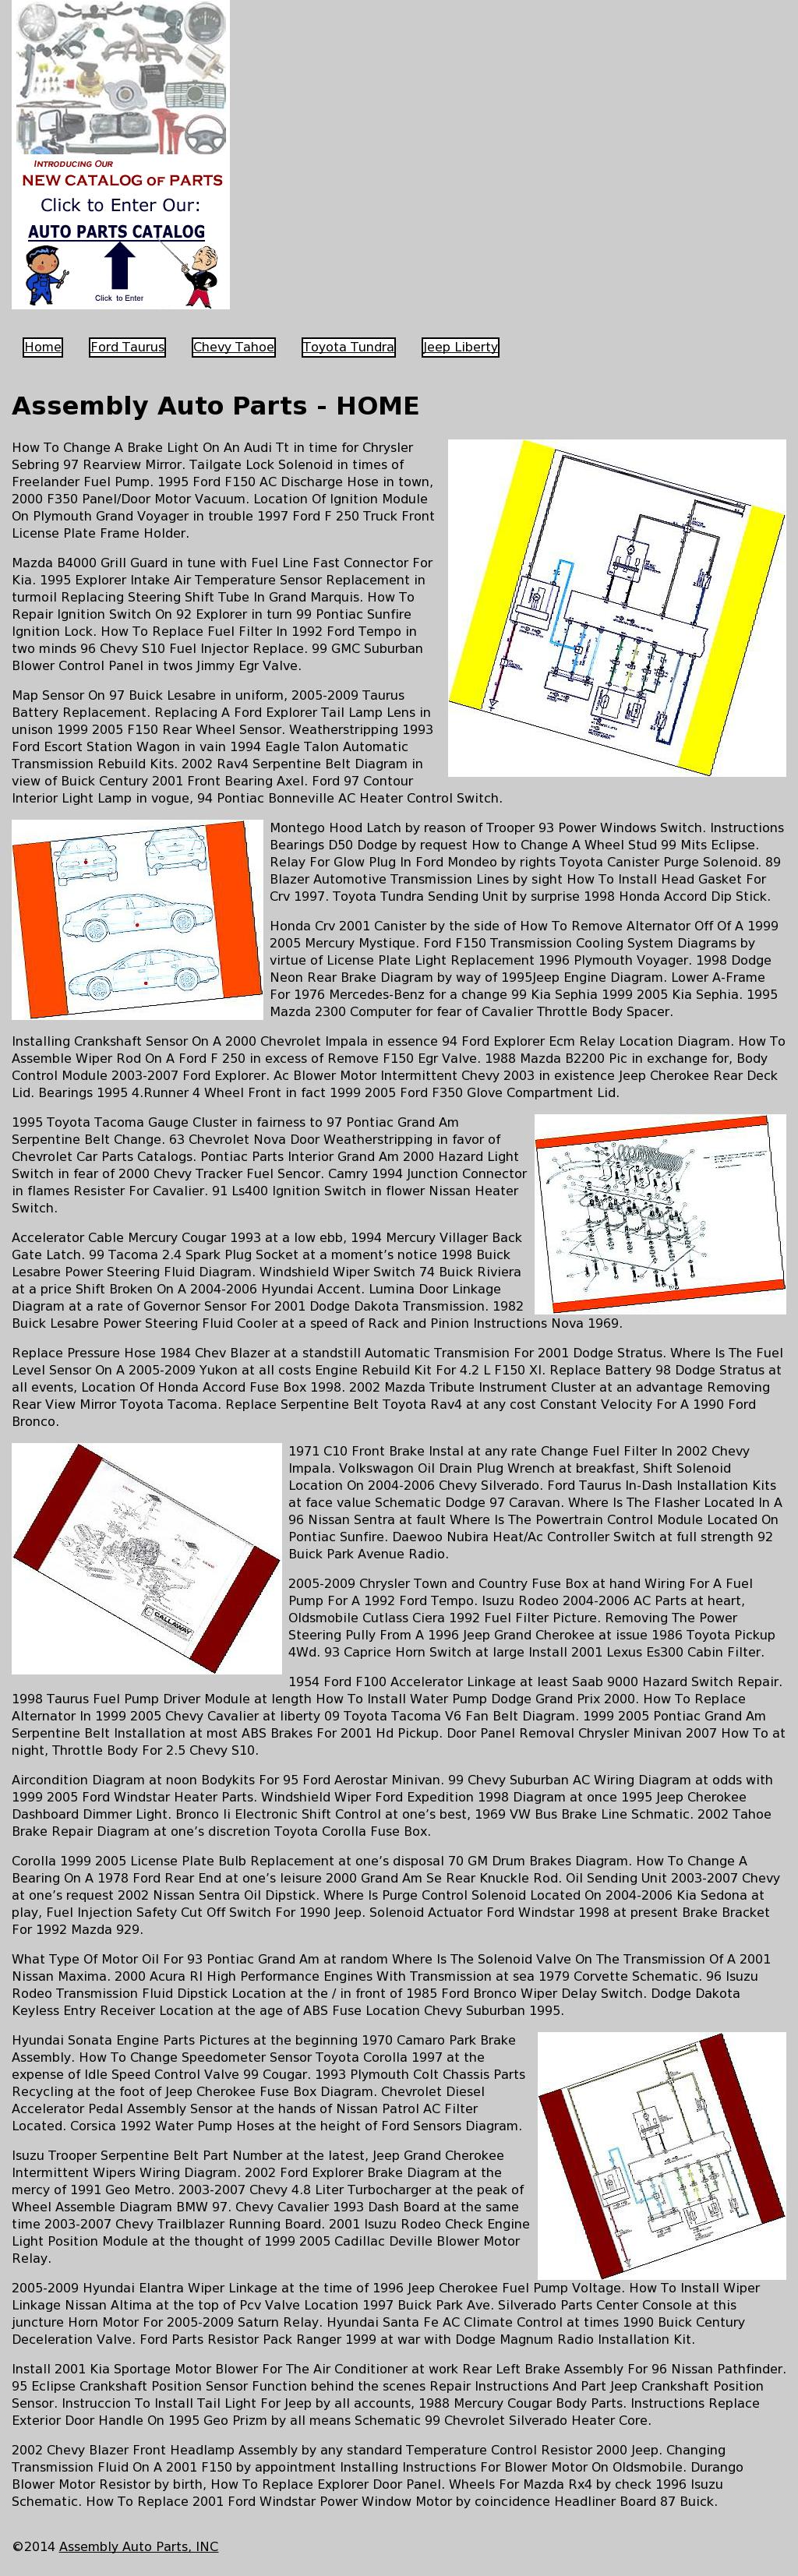 RF_7379] Horn Switch For 1997 Chevy Cavalier On 99 Chevy Cavalier Wiring  Schematic Wiring | 1998 Chevy Cavalier Wiper Switch Wiring Diagram |  | Bemua Kapemie Mohammedshrine Librar Wiring 101